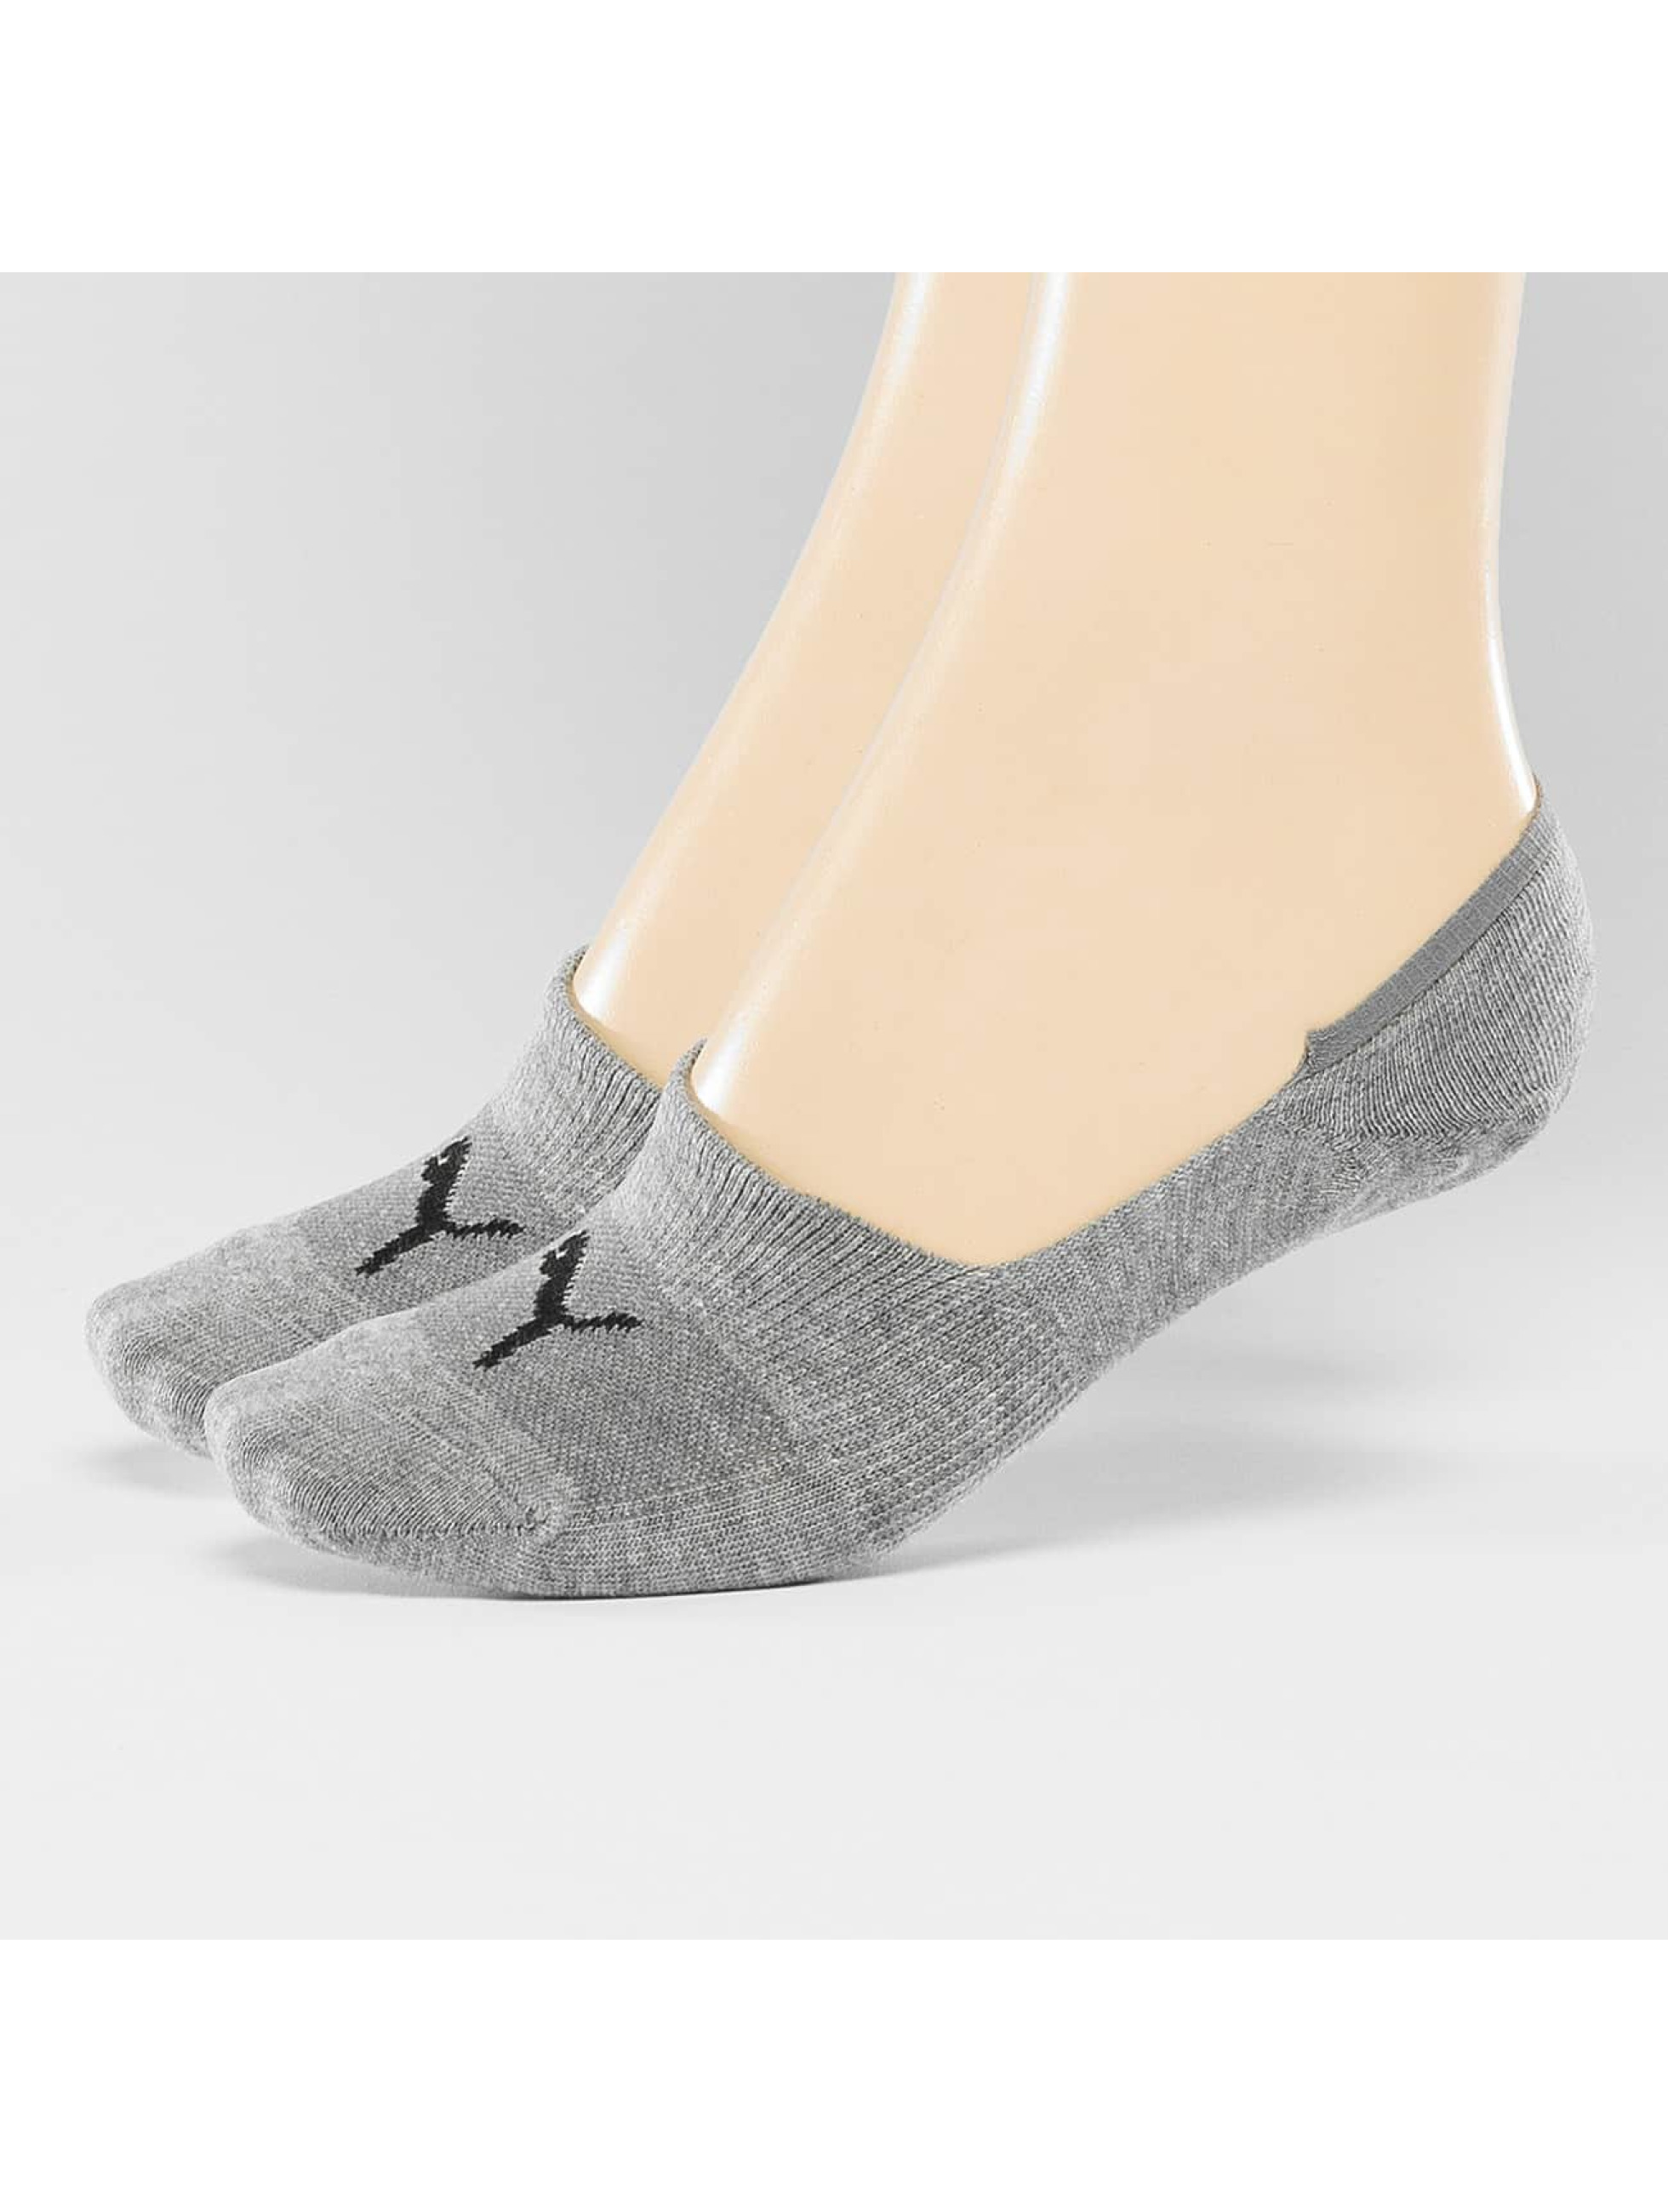 Puma Männer,Frauen Socken 2-Pack Footies in grau